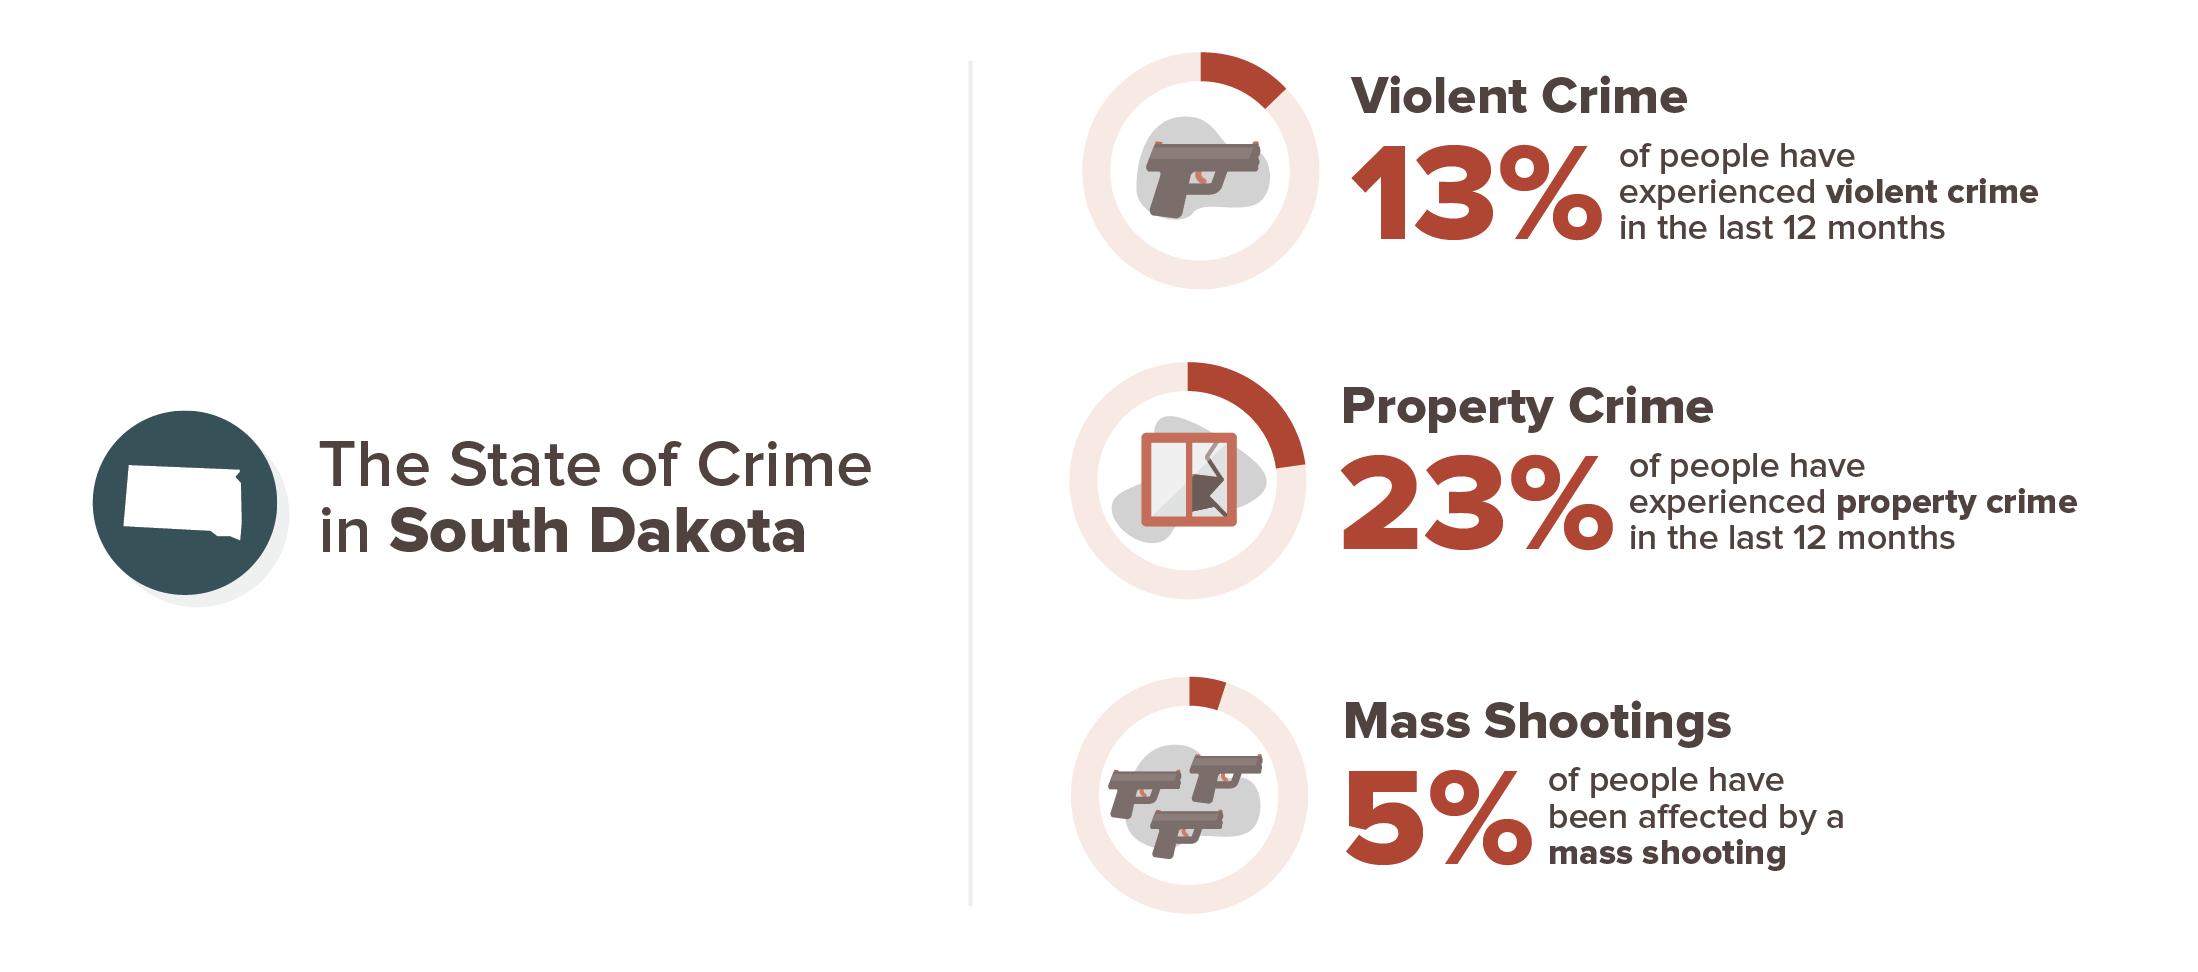 13 percent have experience violent crime, 23 percent have experienced property crime, 5 percent have experiences a mass shooting